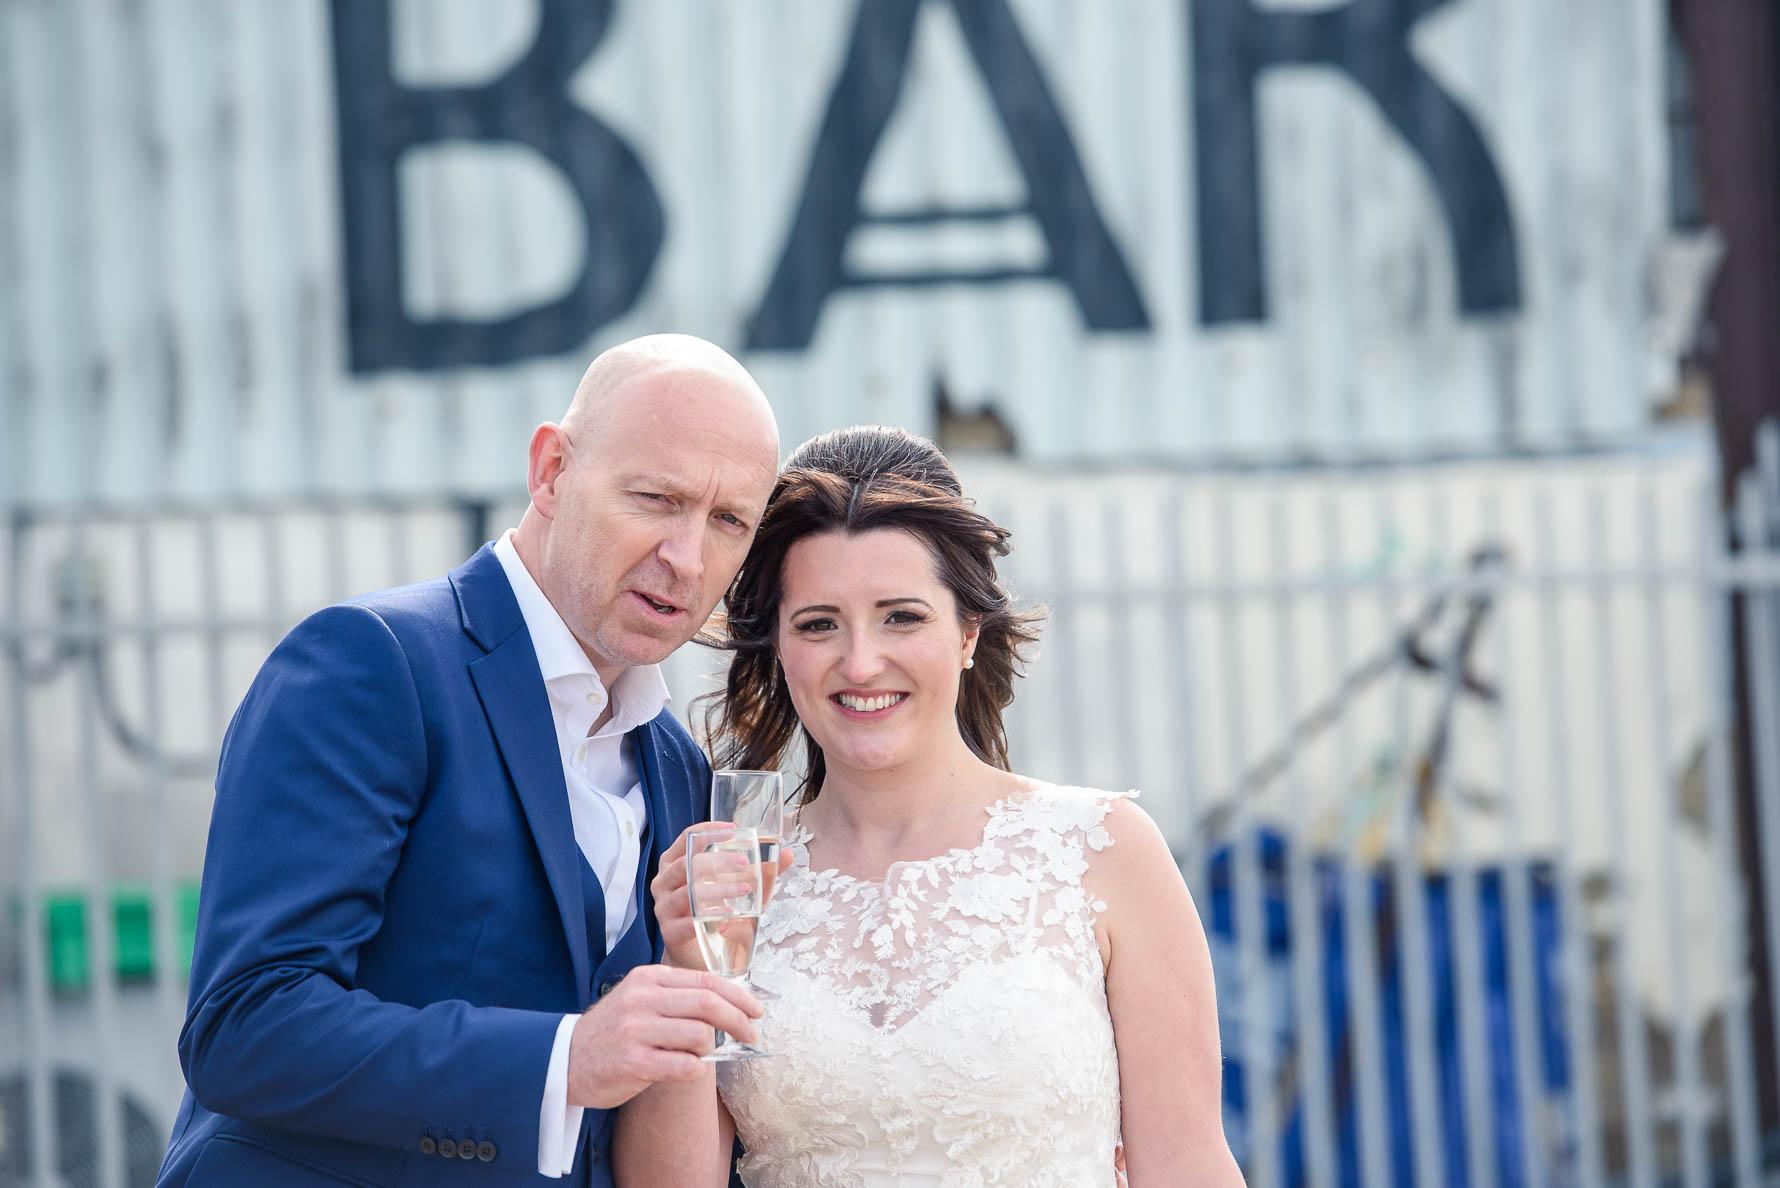 Wedding Photography at East Quay Venue-66.jpg